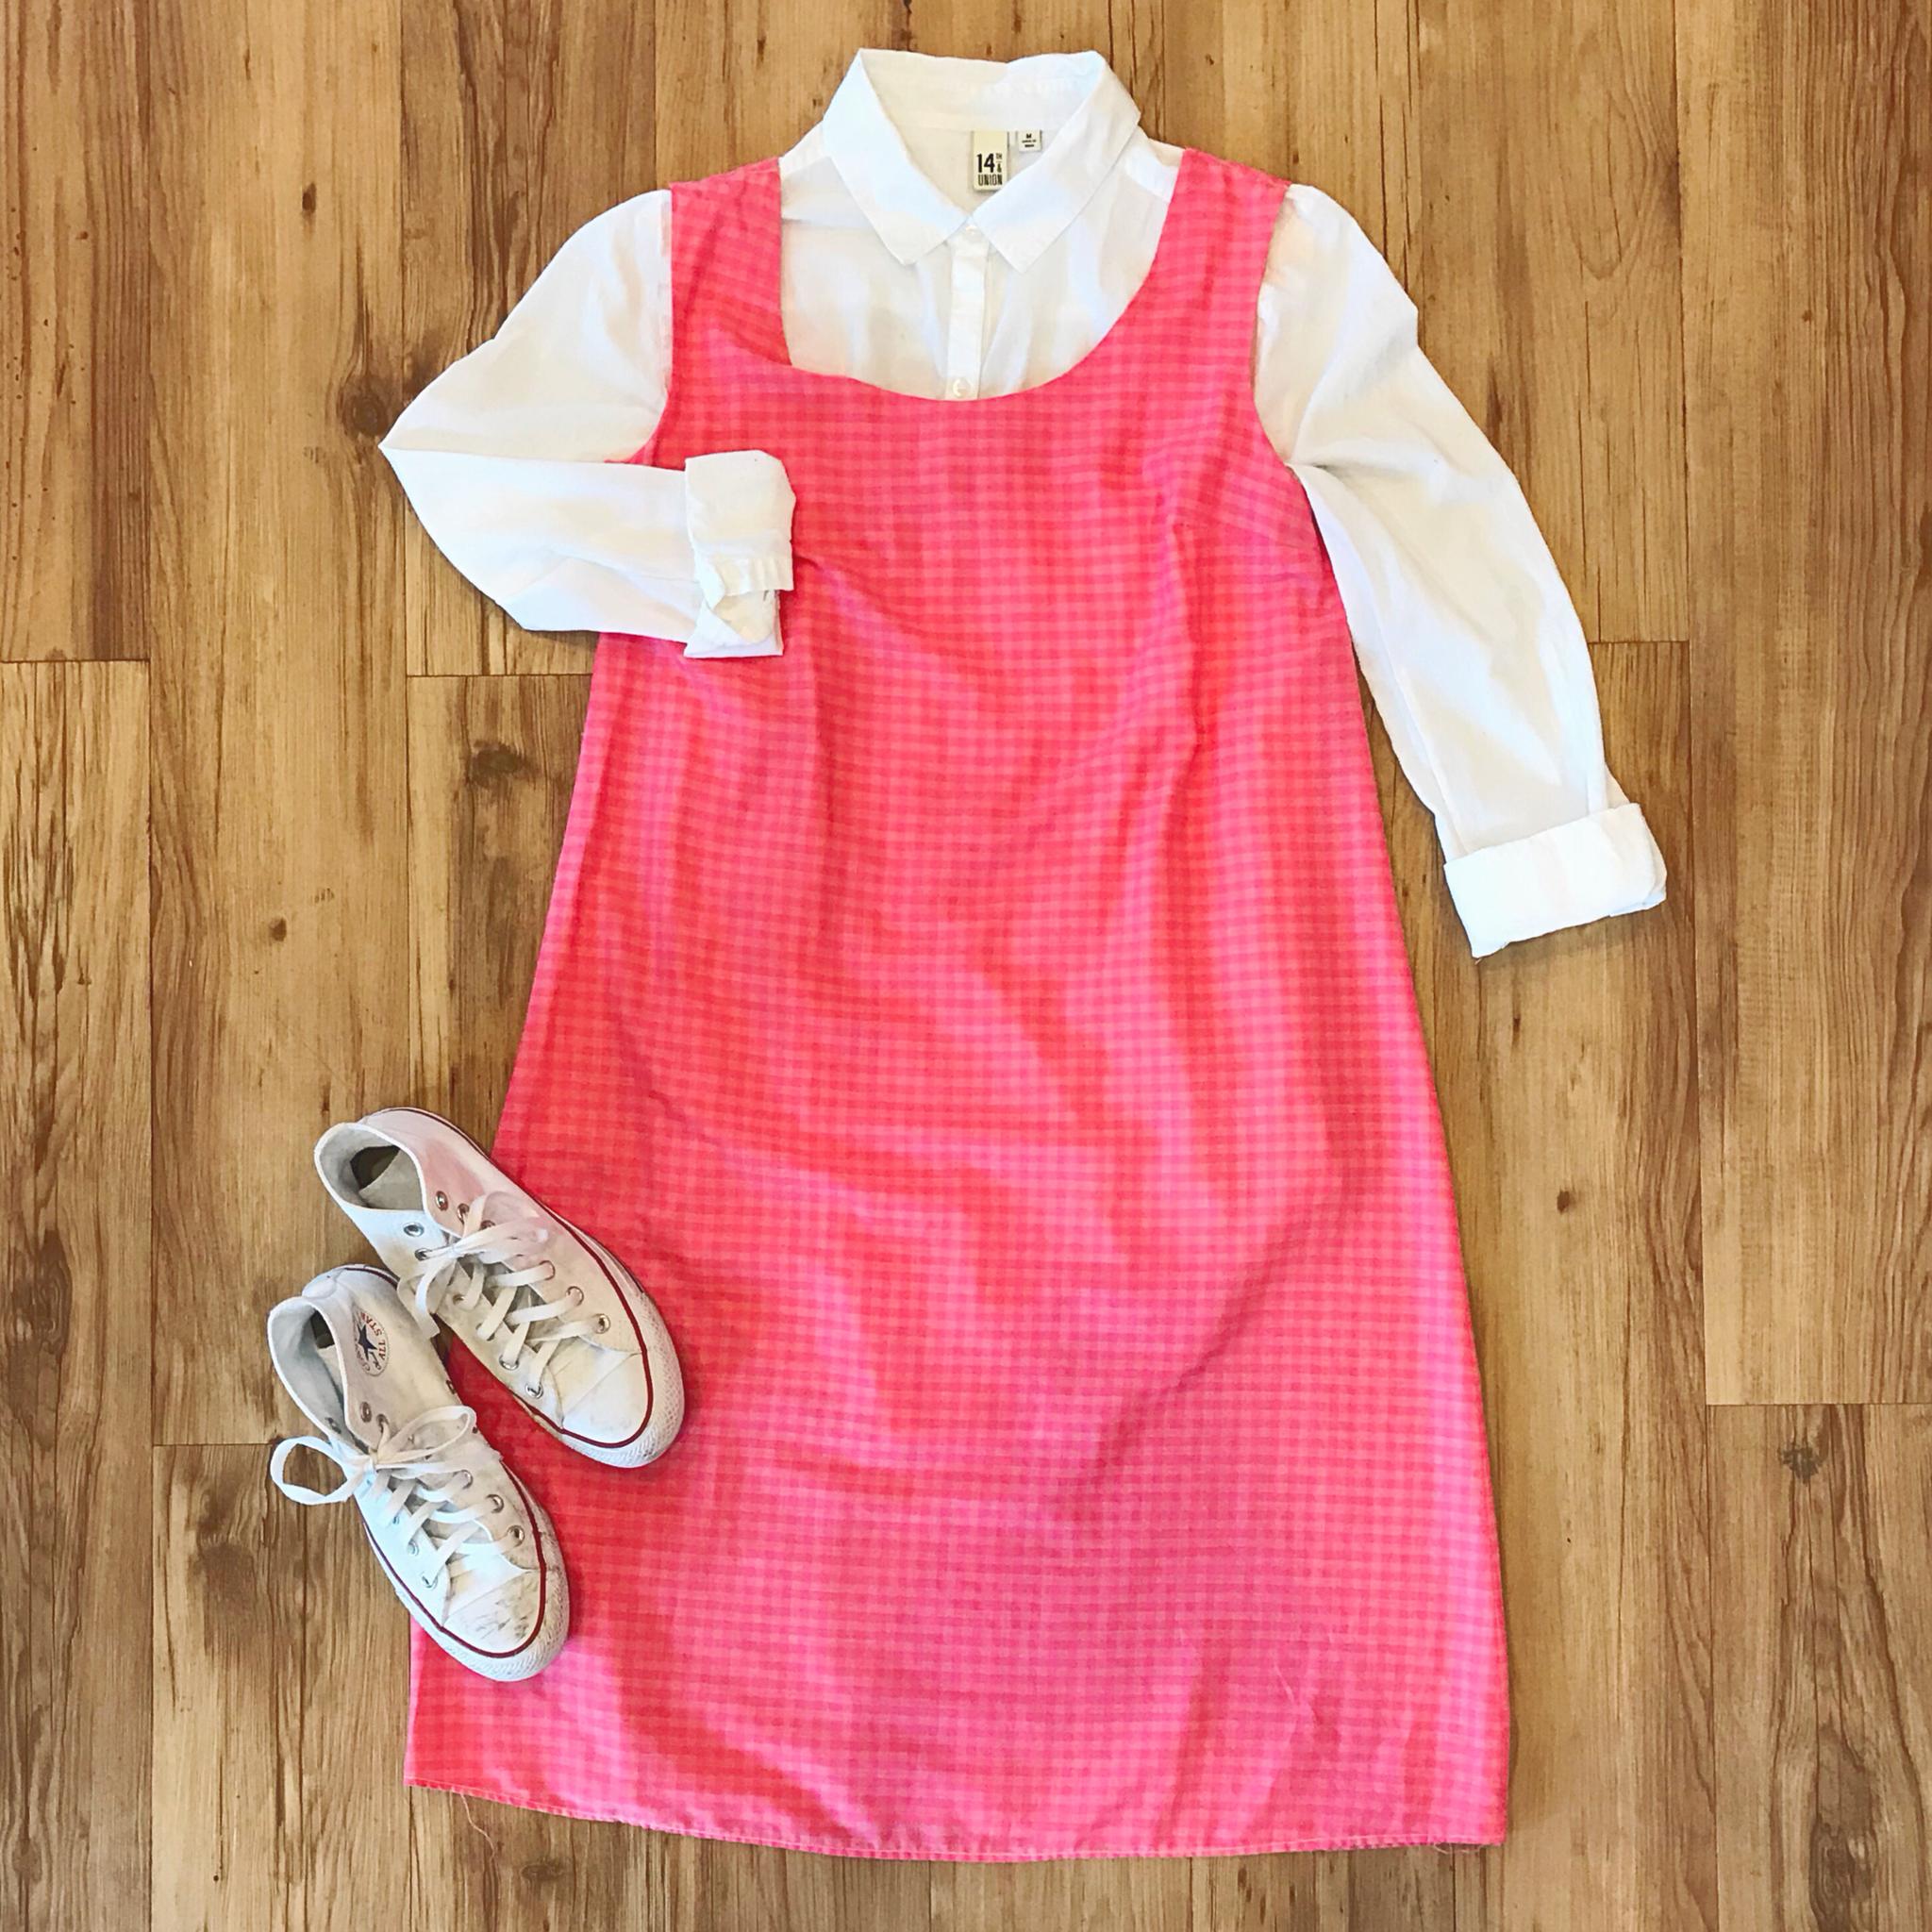 1960s Pink Gingham Dress 00003